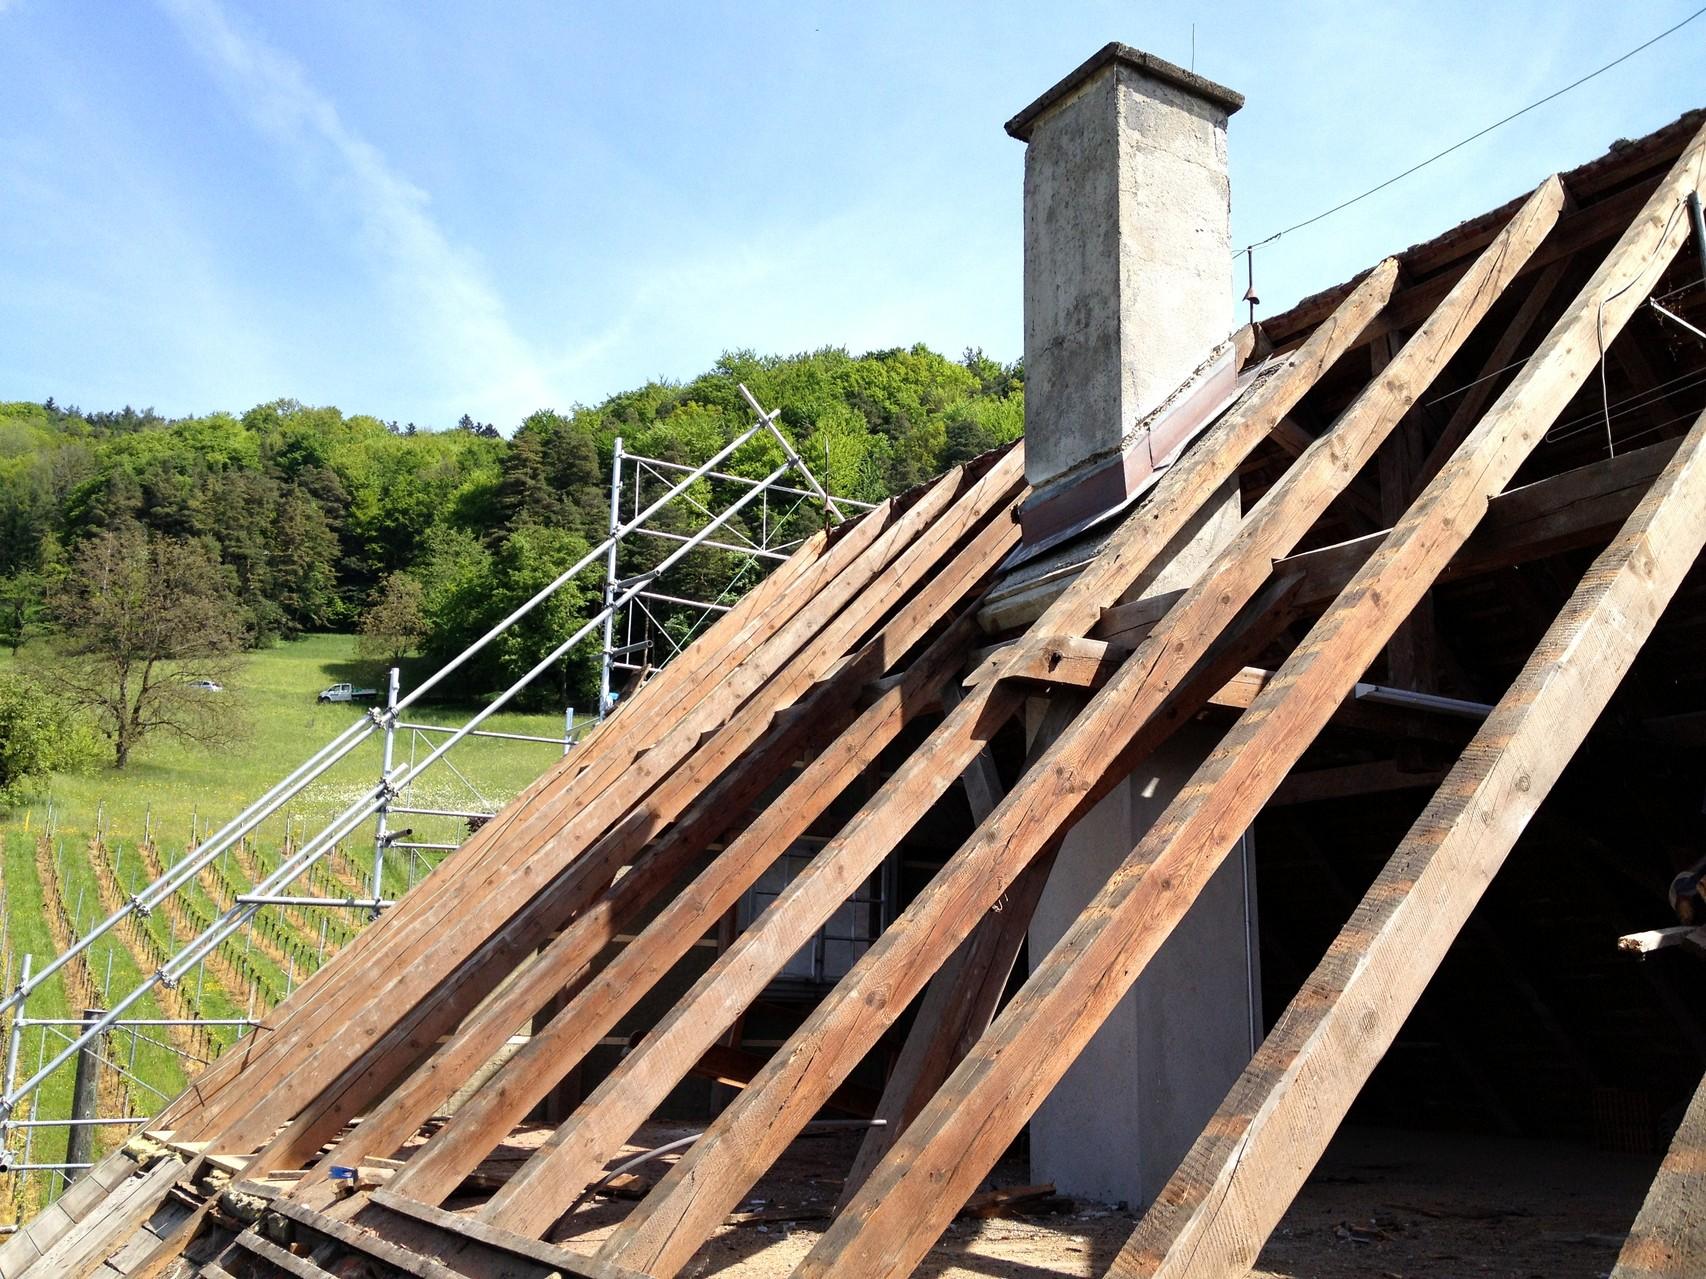 Dach Rückbau, Gebälk bleibt bestehen